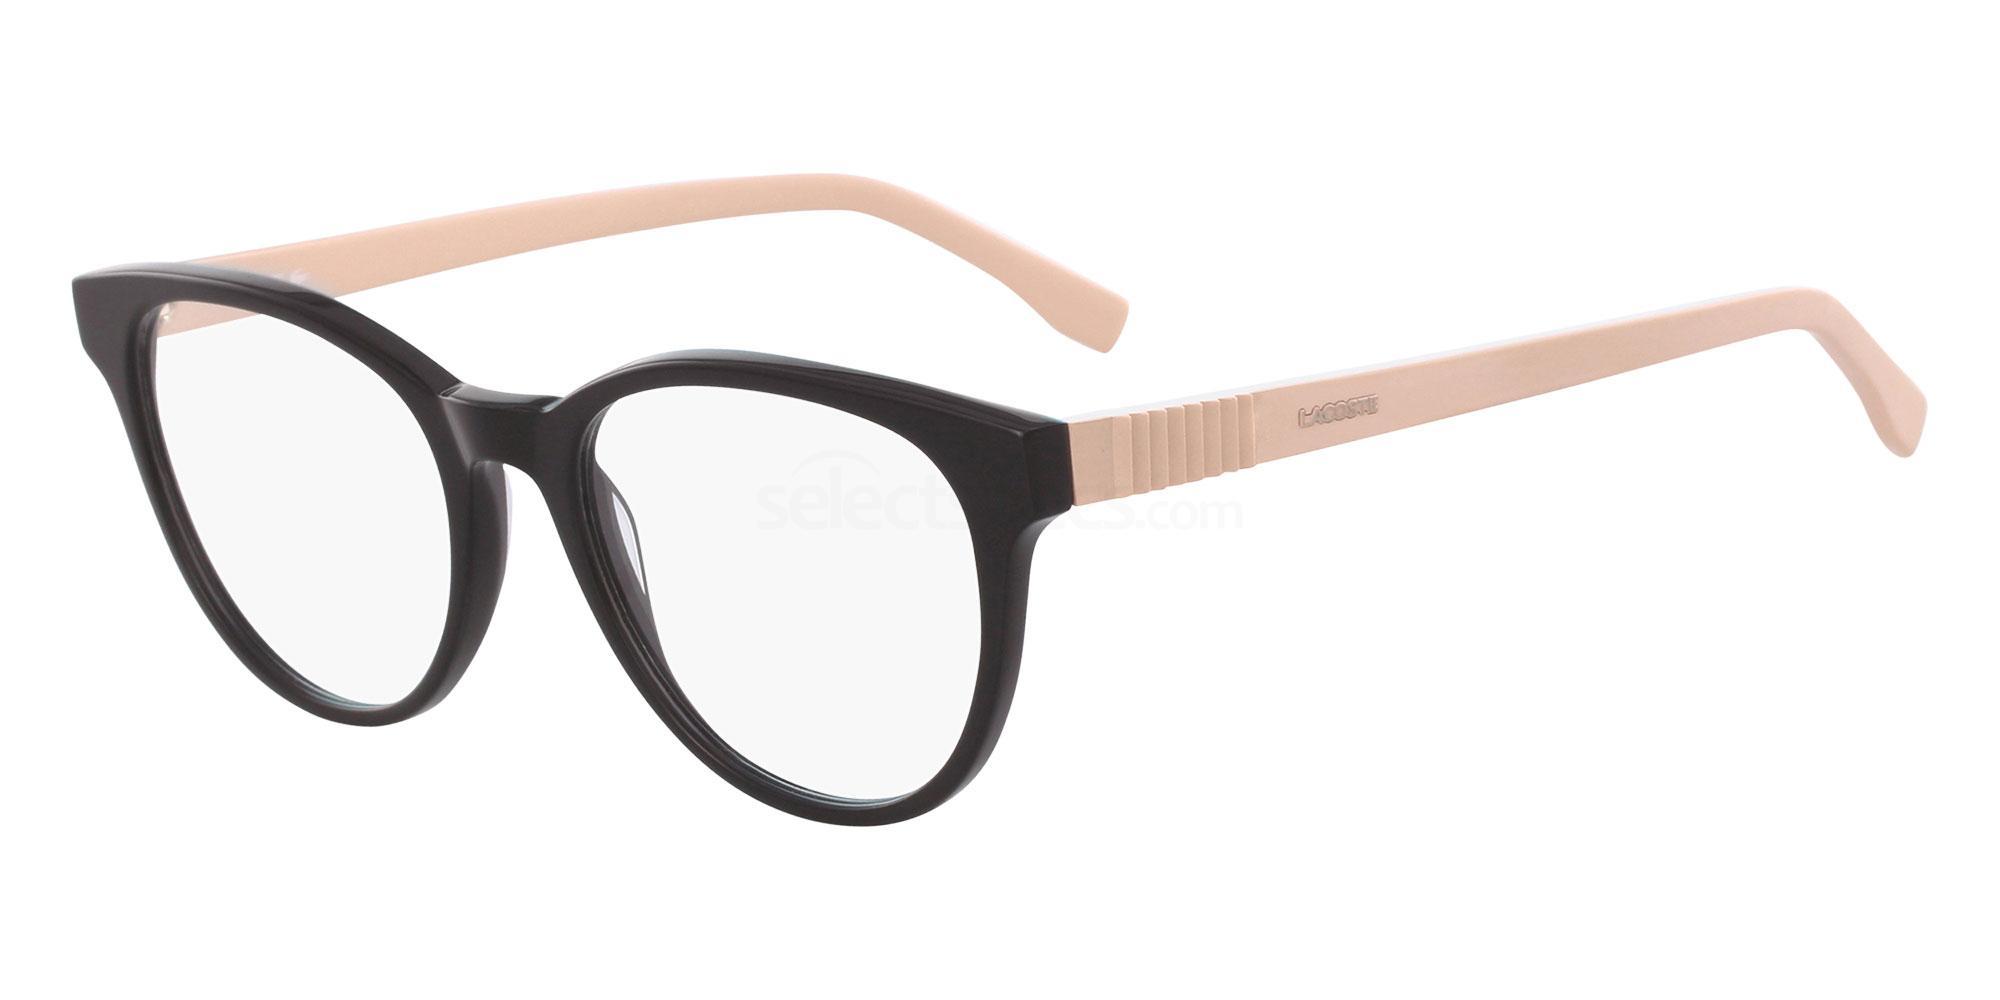 001 L2834 Glasses, Lacoste